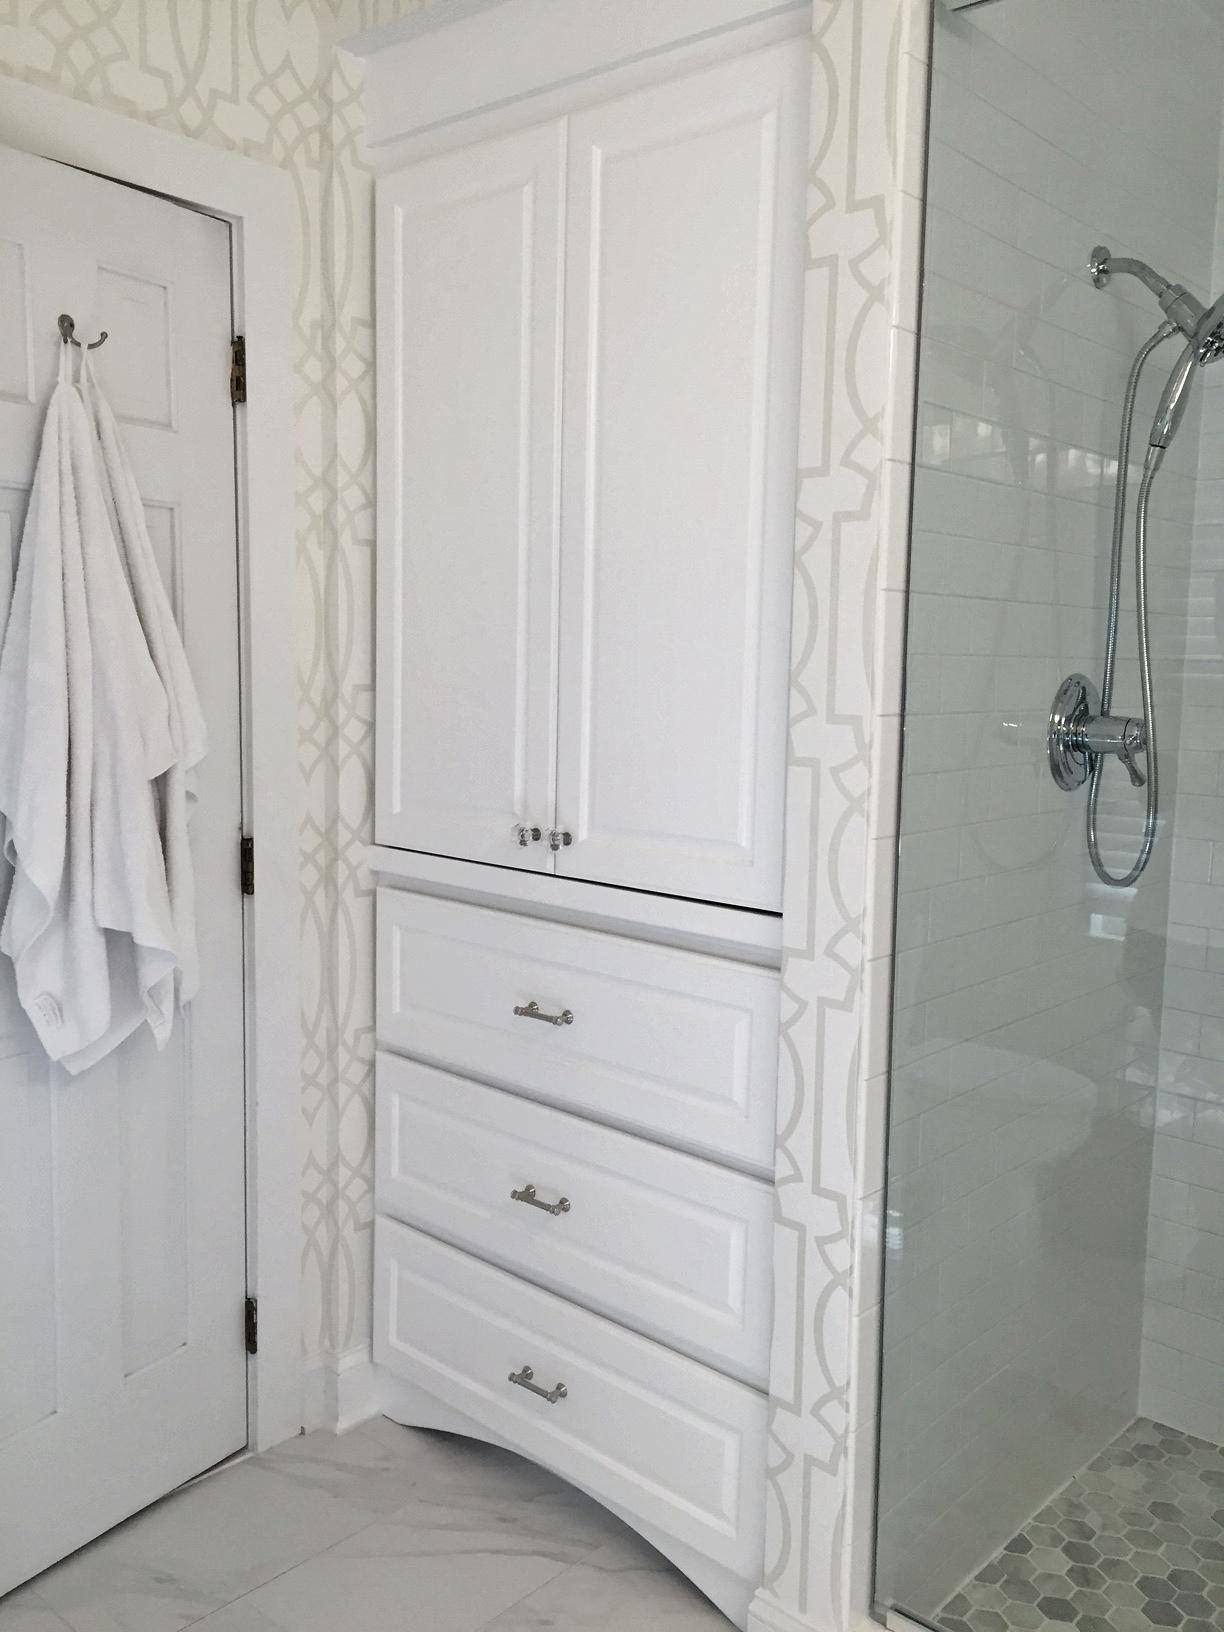 Linen Cabinet with Raised Panel Doors, Drawers & Decorative Toe-Kick